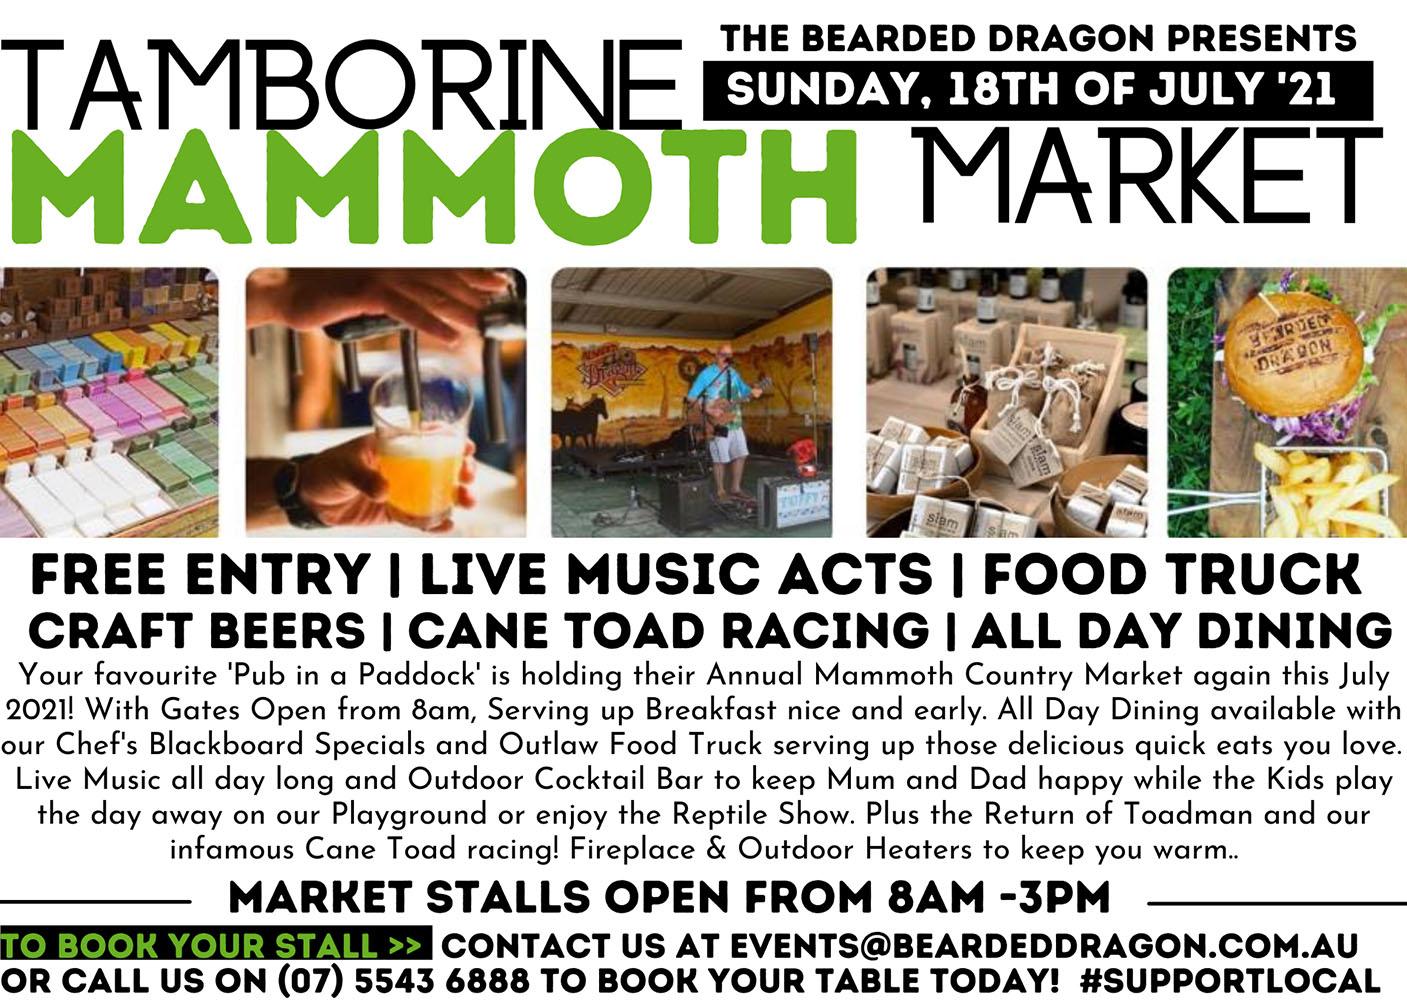 Annual Tamborine Mammoth Market